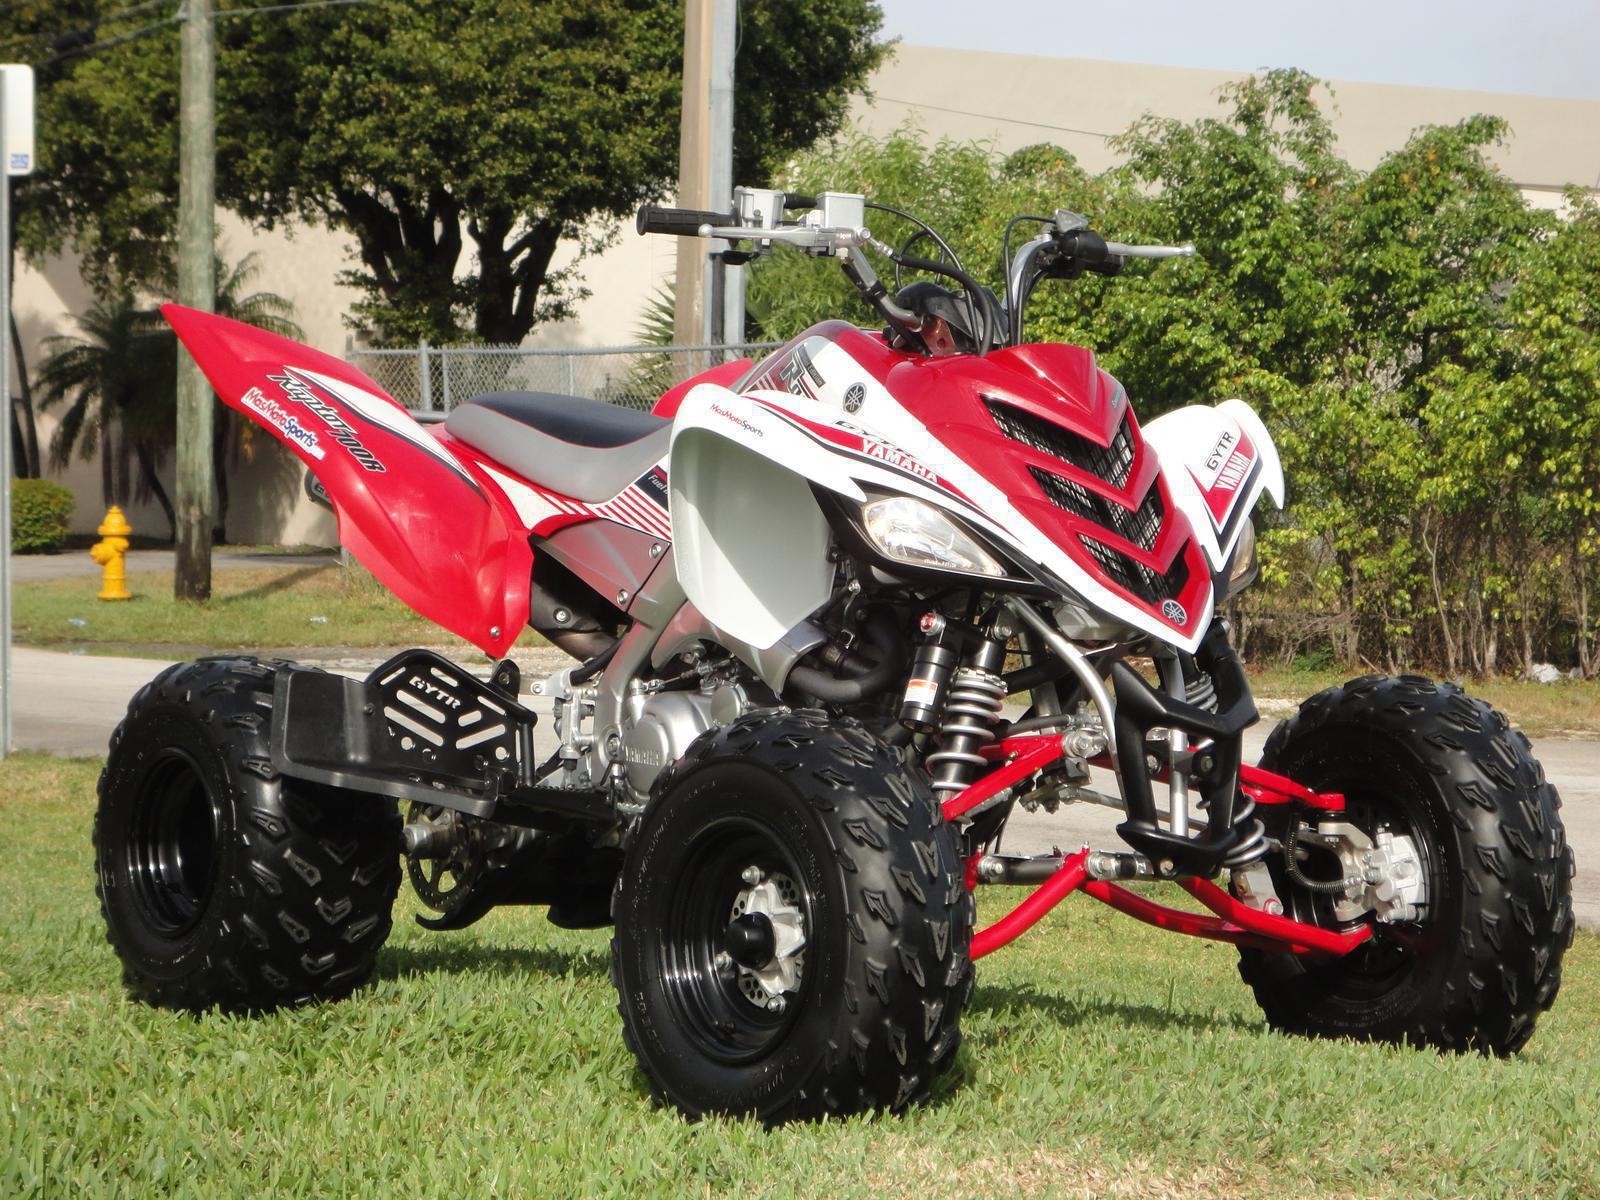 2010 Yamaha Raptor 700 Wiring Diagram Start Building A 350 2008 Best Image 2018 Rh Oceanodigital Us Banshee 250